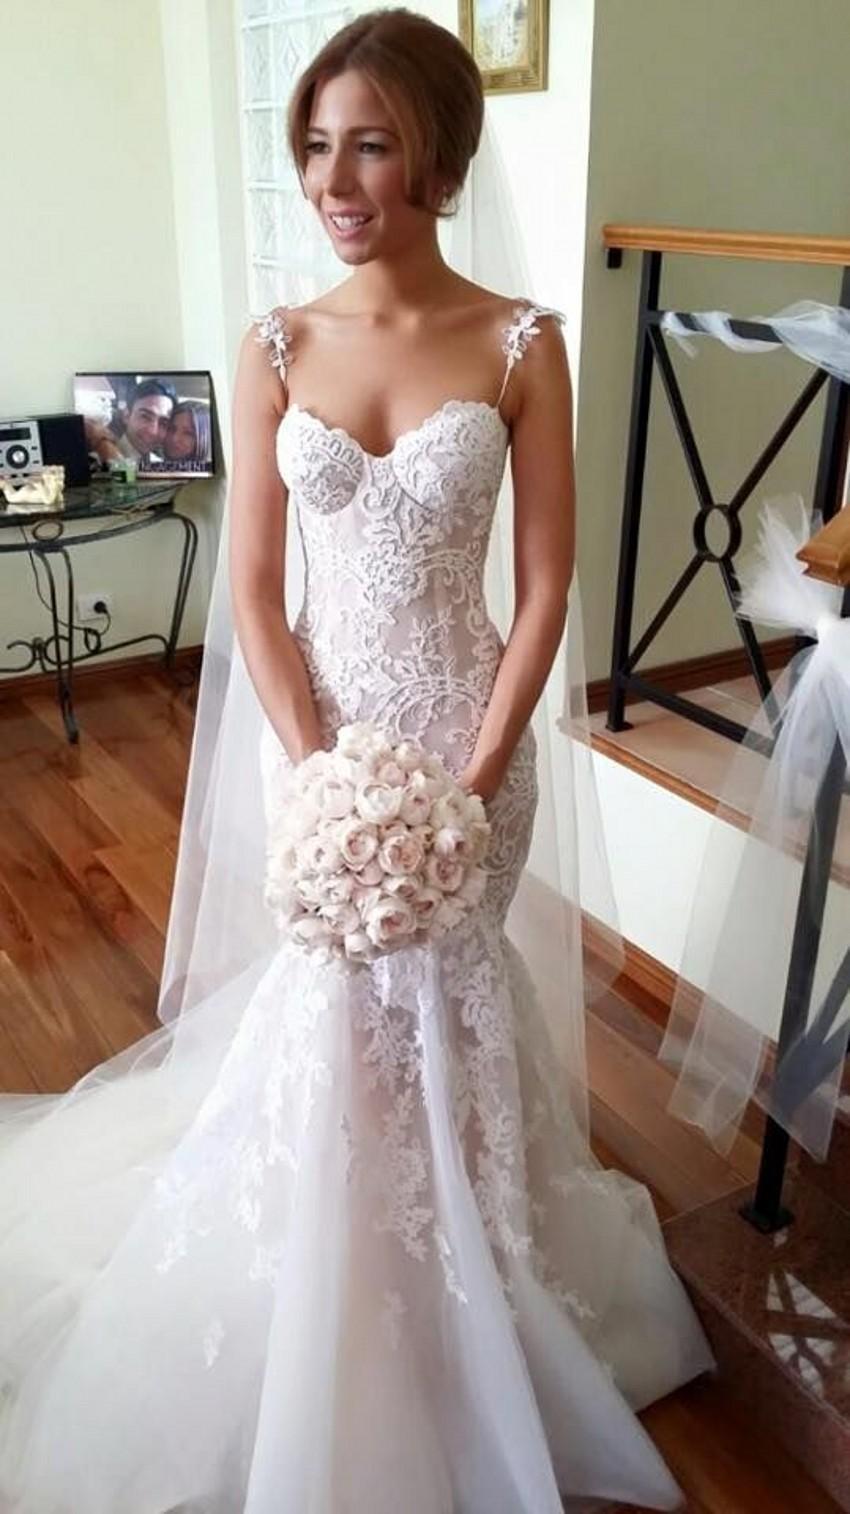 Spaghetti Strap Mermaid Wedding Dress  Long Applique Sleeveless Mermaid Spaghetti Strap Tulle